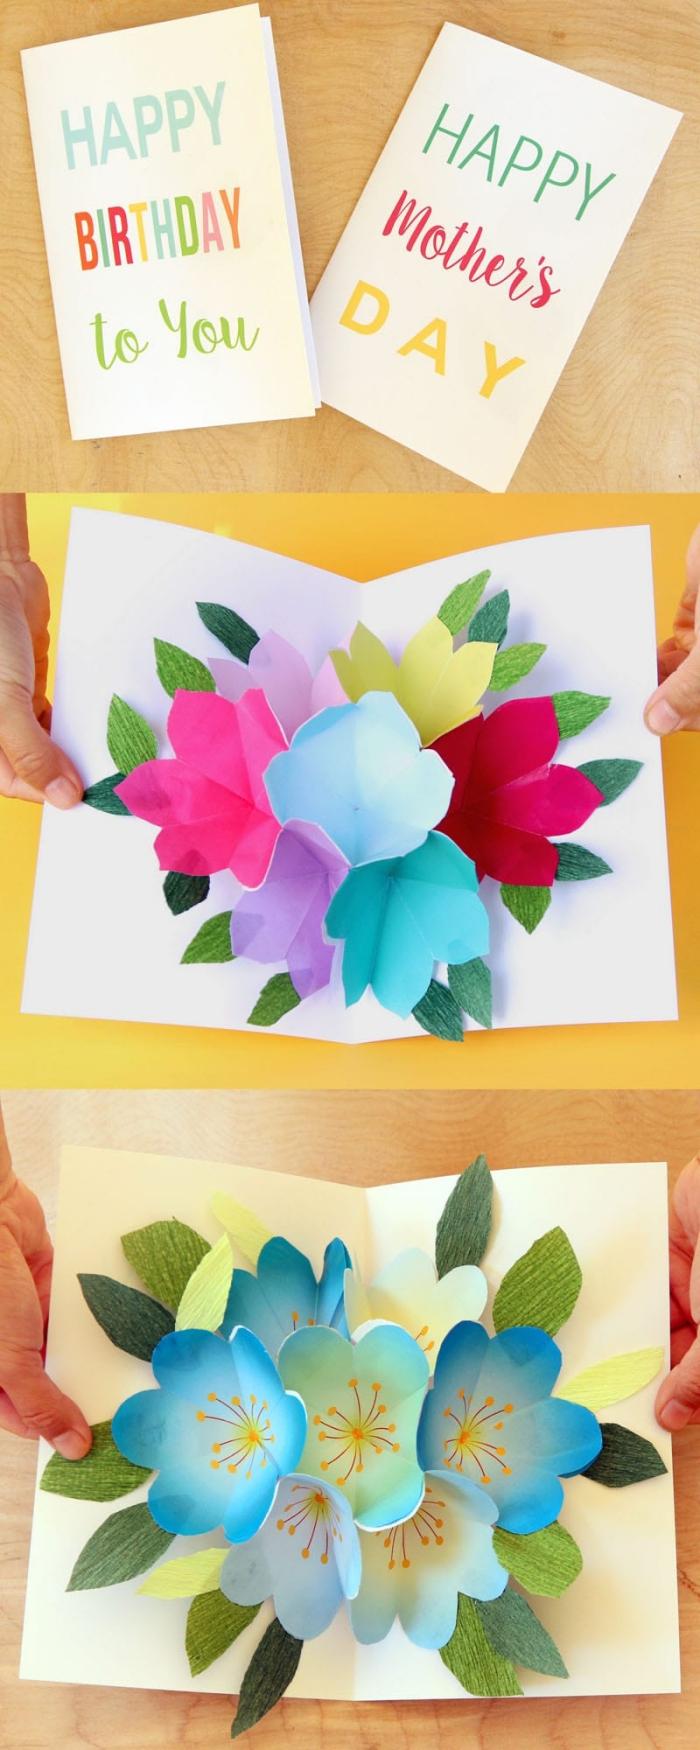 Cartolina ad armonica, disegno di carta fiori, biglietti auguri fai da te pop up